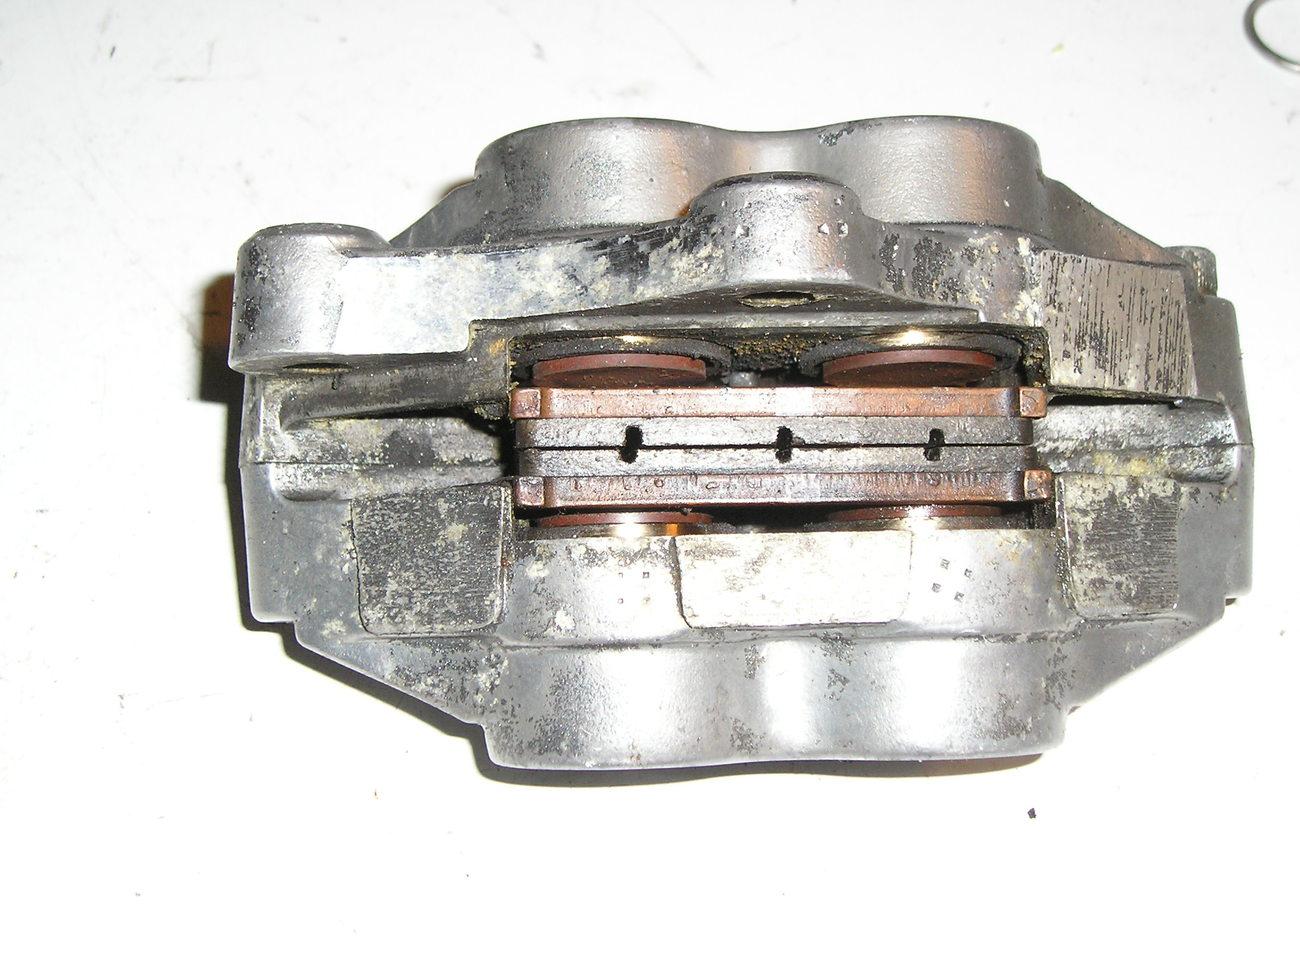 Kawasaki ZX750L '93-'95 left front brake caliper